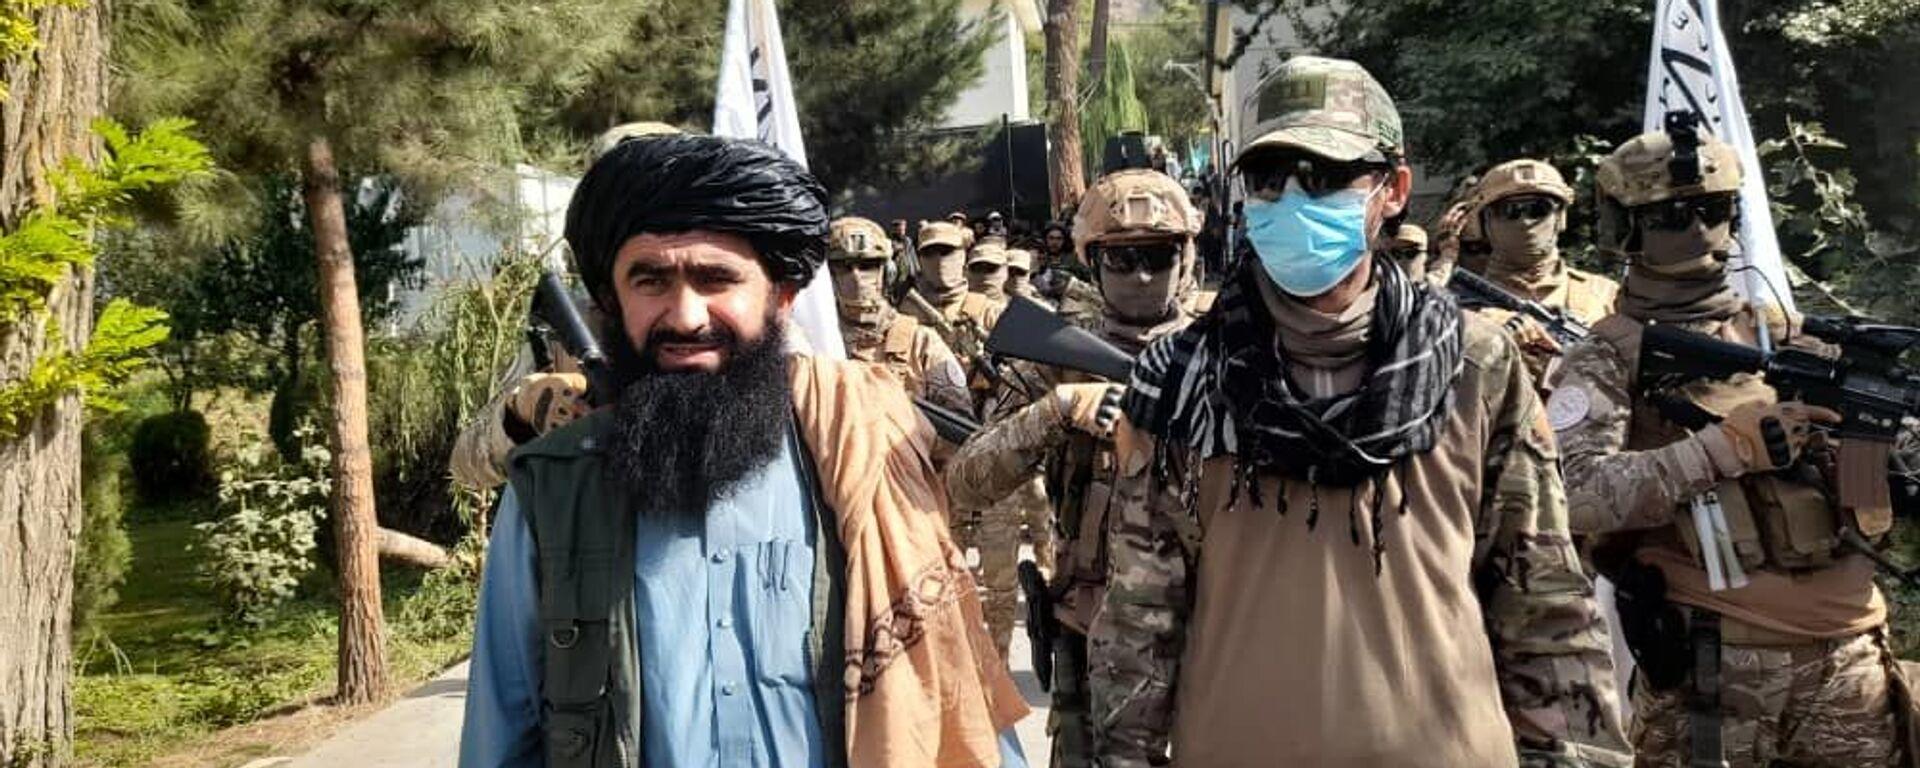 Парад специального отряда талибов под названием Мансури в провинции Бадахшан - Sputnik Узбекистан, 1920, 24.09.2021